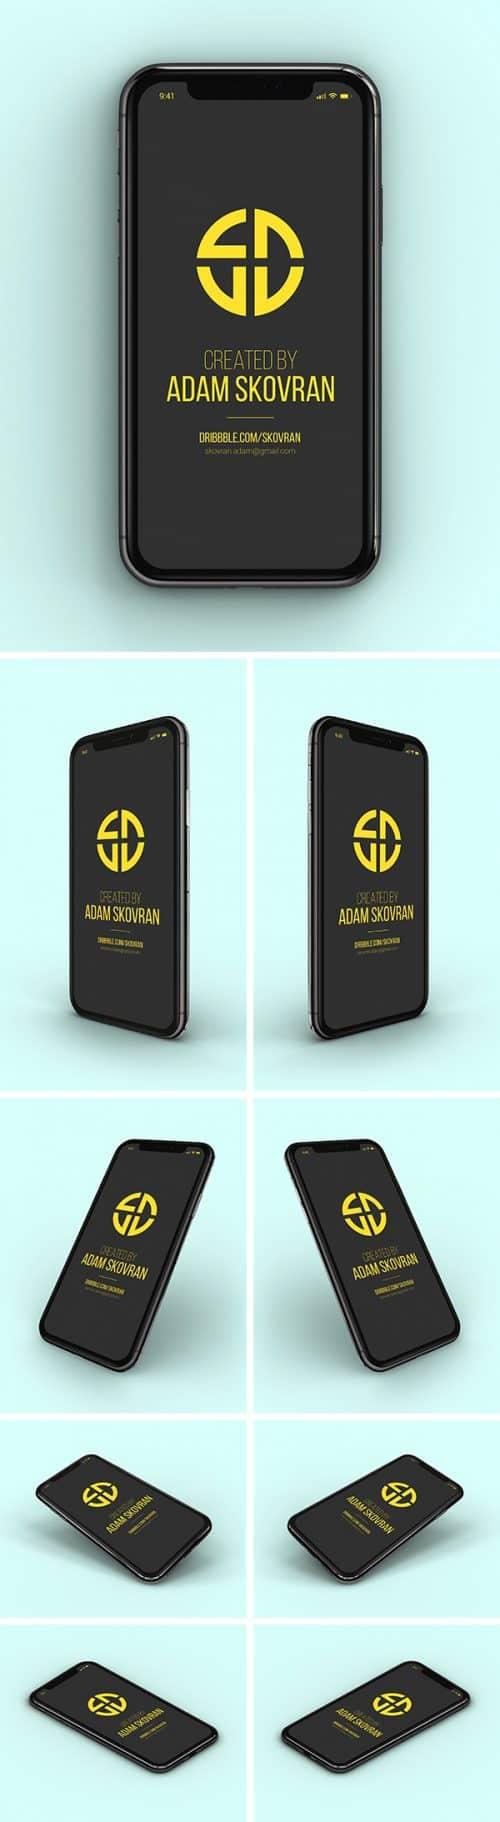 Asset | iPhone X MockUps – 9 Angles